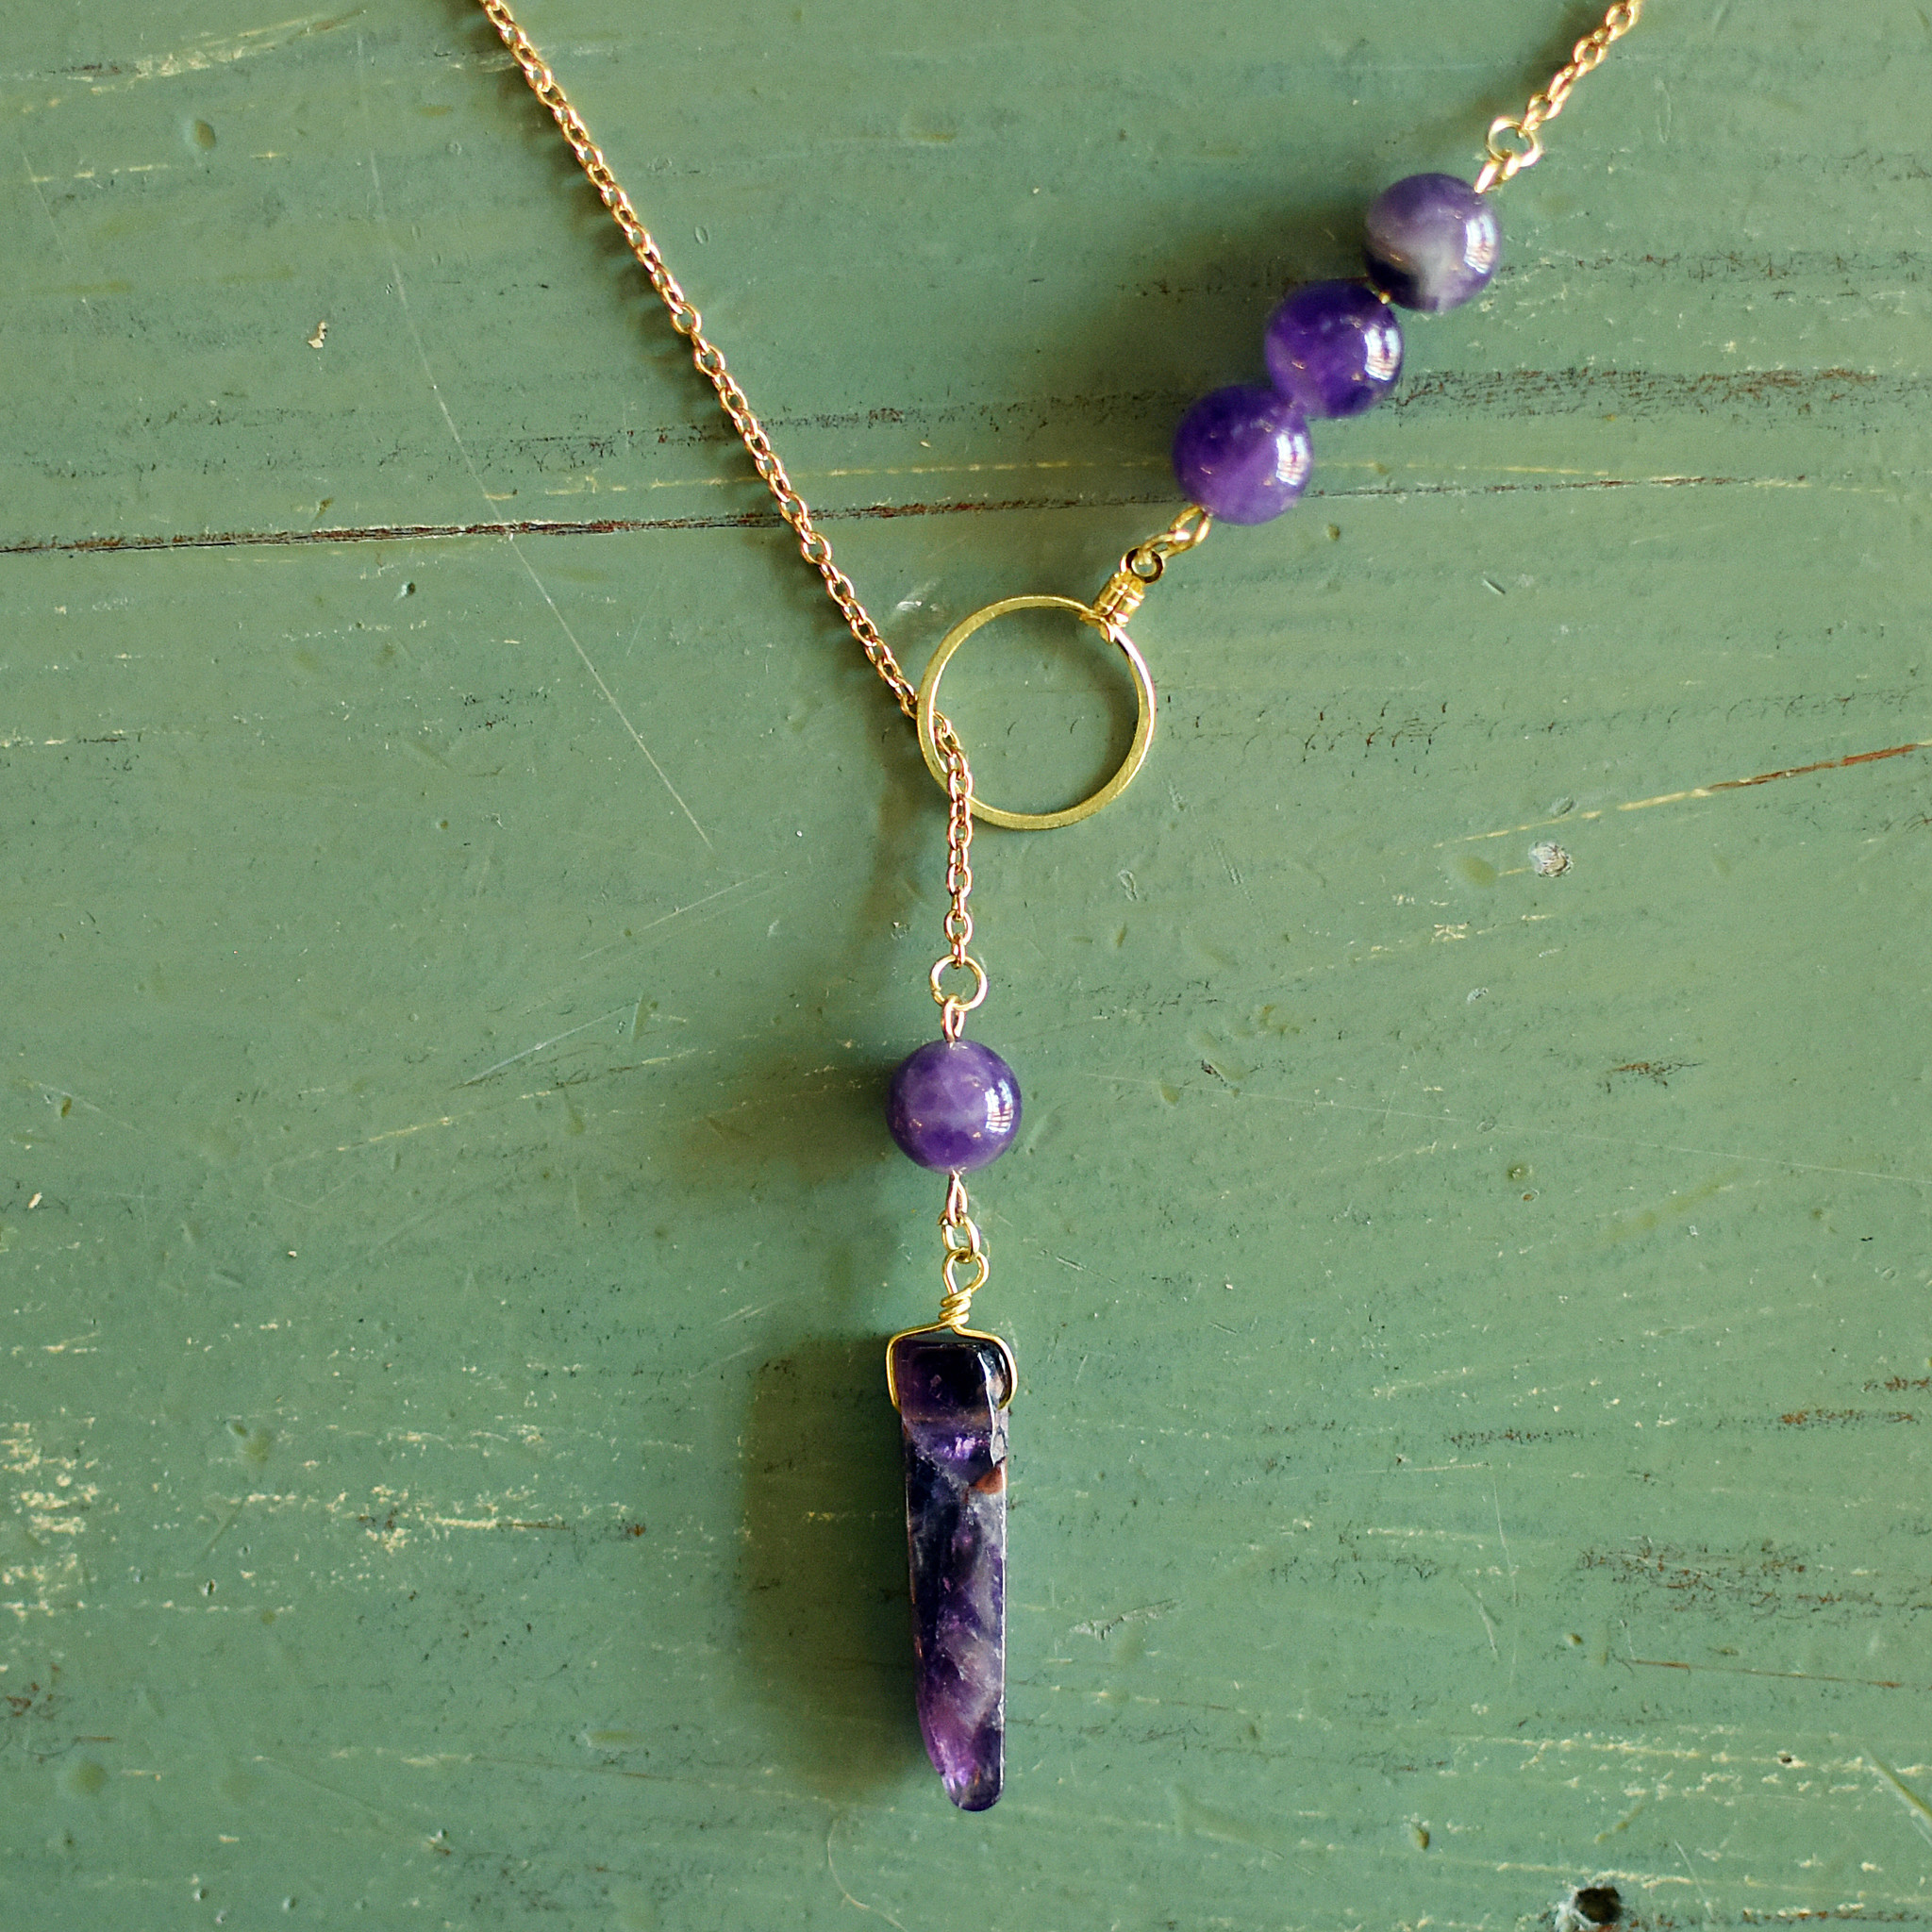 dara firoozi dara firoozi amethyst necklace